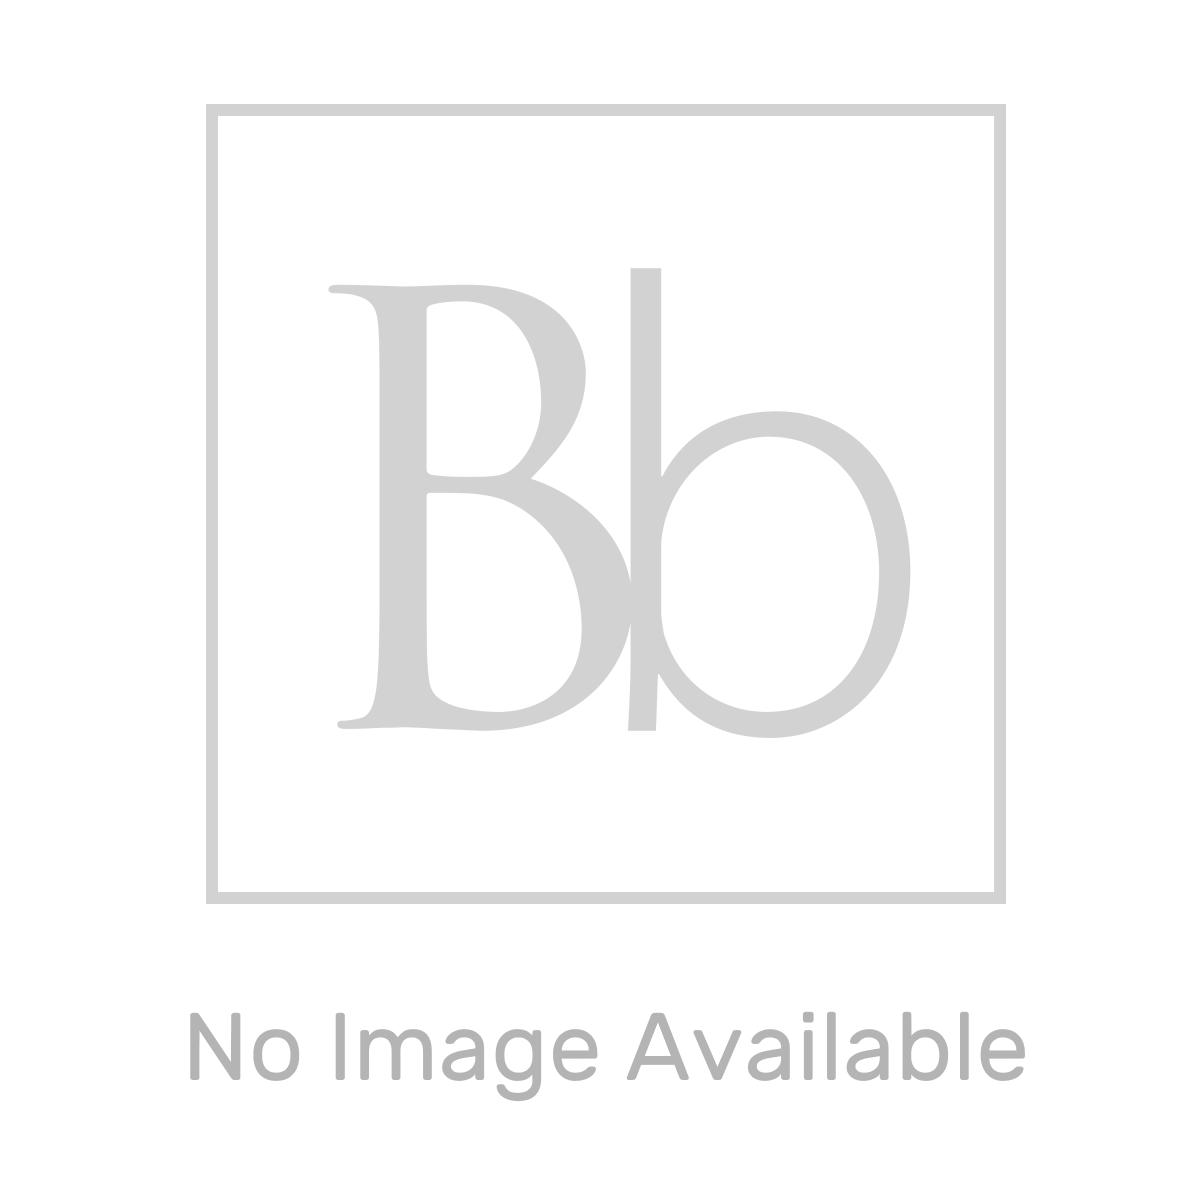 Aquadart Rectangular 1200 x 900 Shower Tray